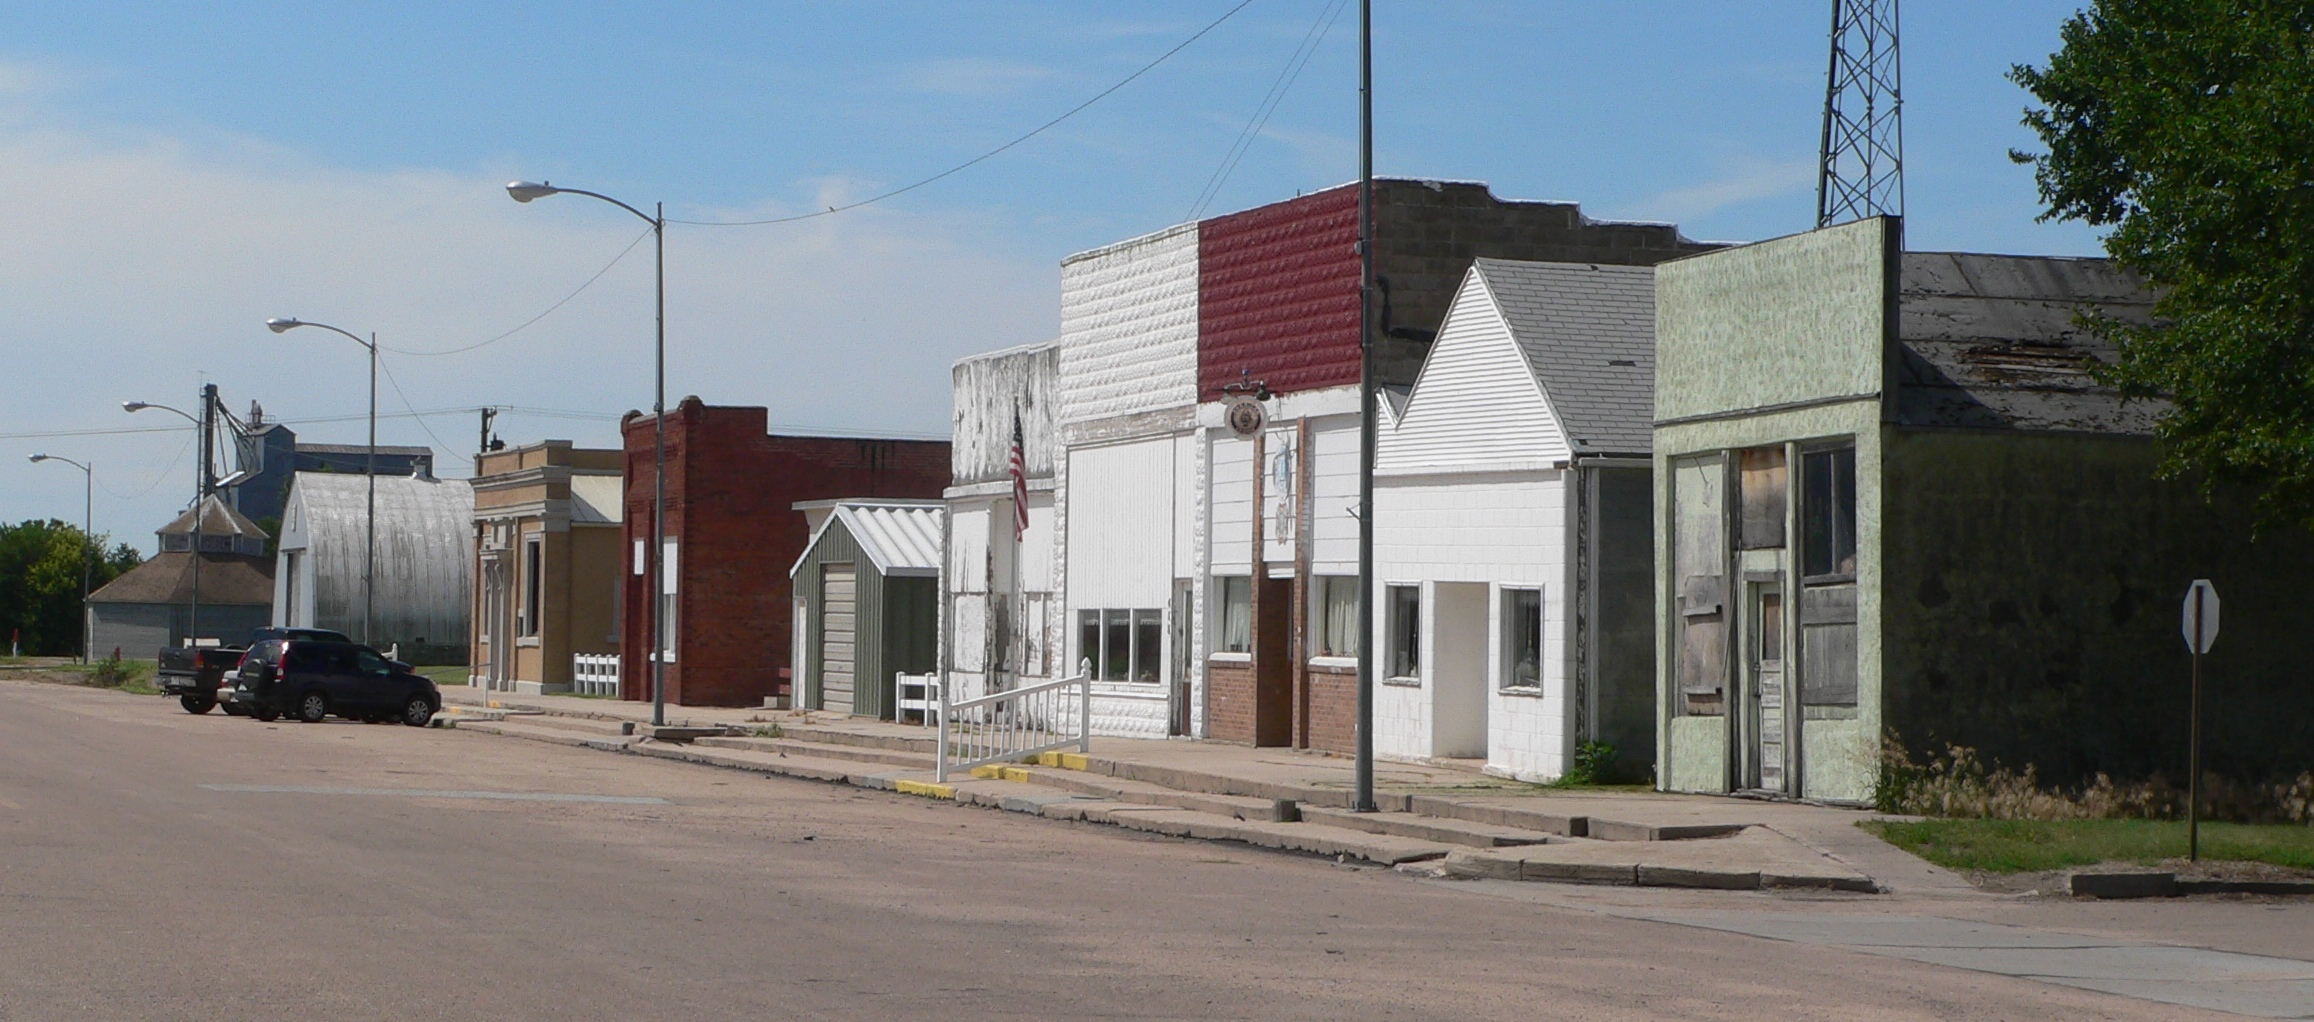 Bartley funeral homes funeral services flowers in nebraska for Nebraska home builders